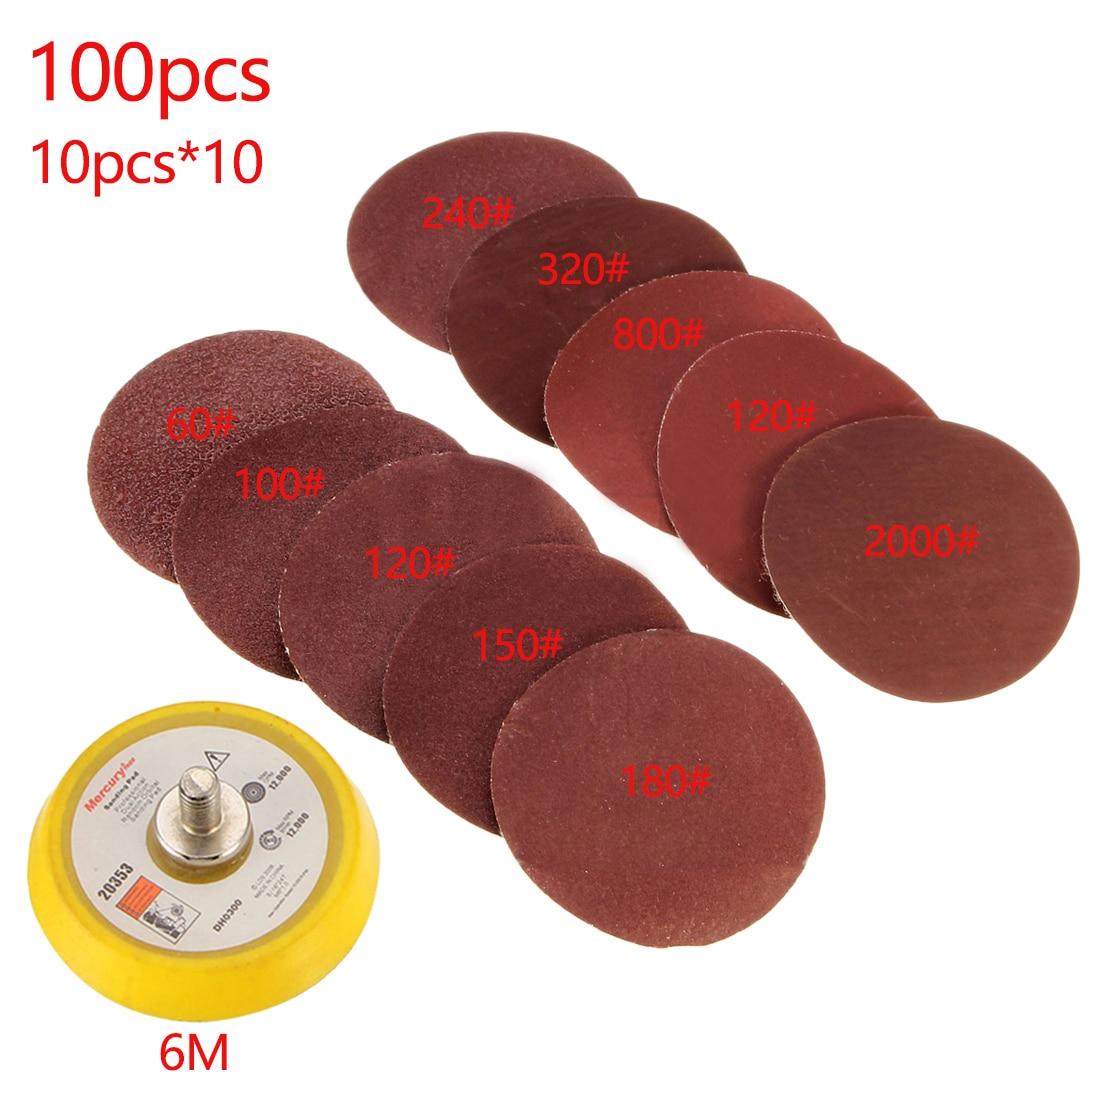 100pcs/set Durable Sander Disc 50mm 60-2000 Grit Paper + 1pc Hook Loop Plate Fit Dremel 4000 Electric Grinder Abrasive Tools